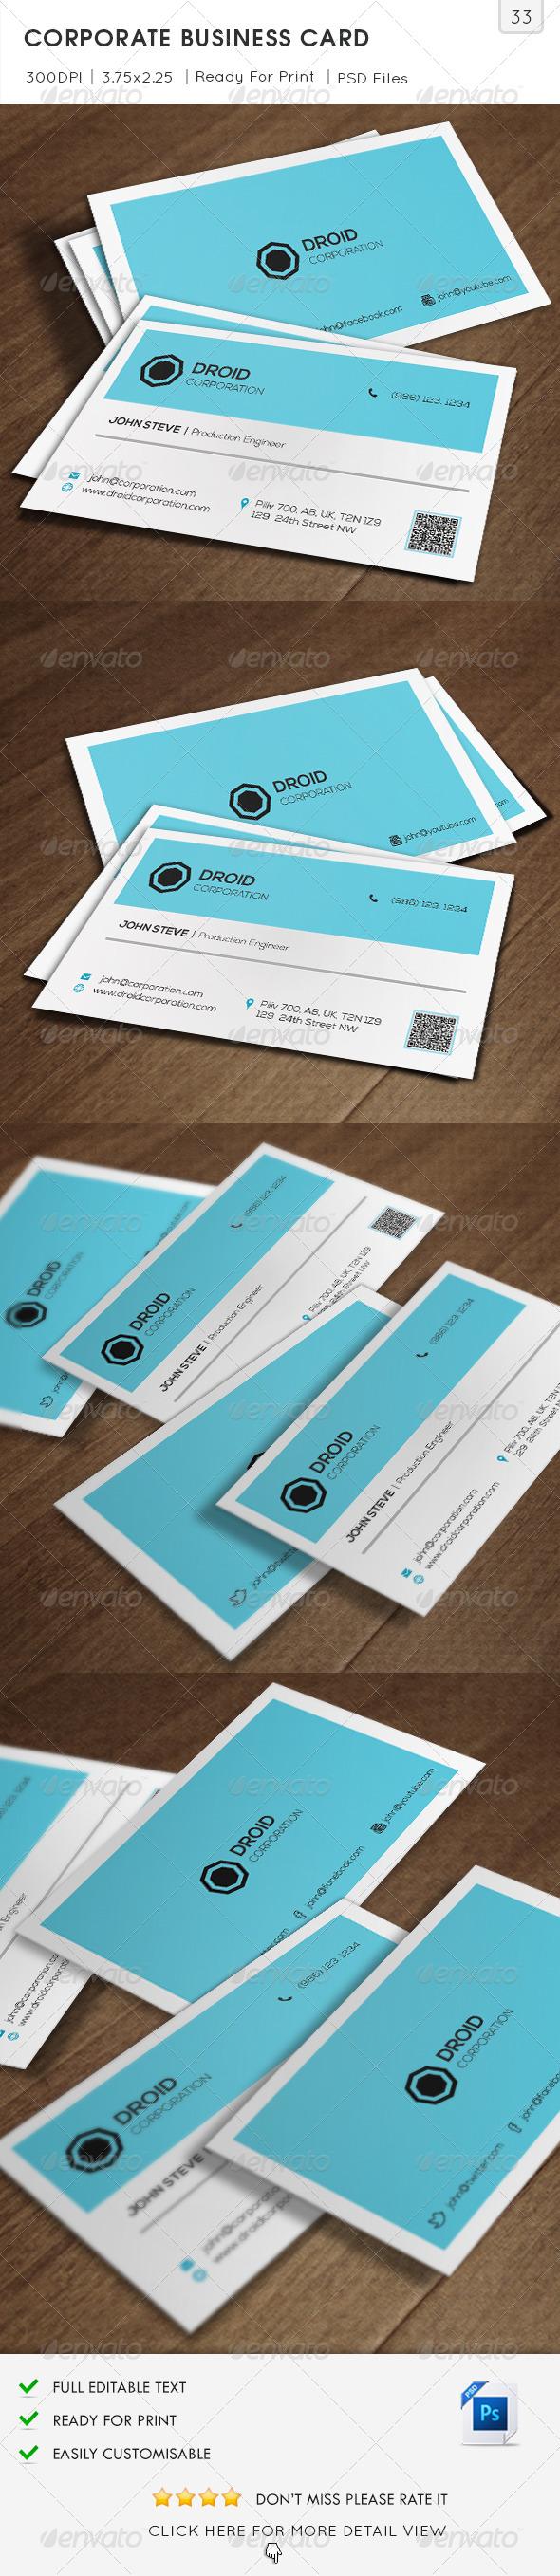 Corporate Business Card v33 - Corporate Business Cards